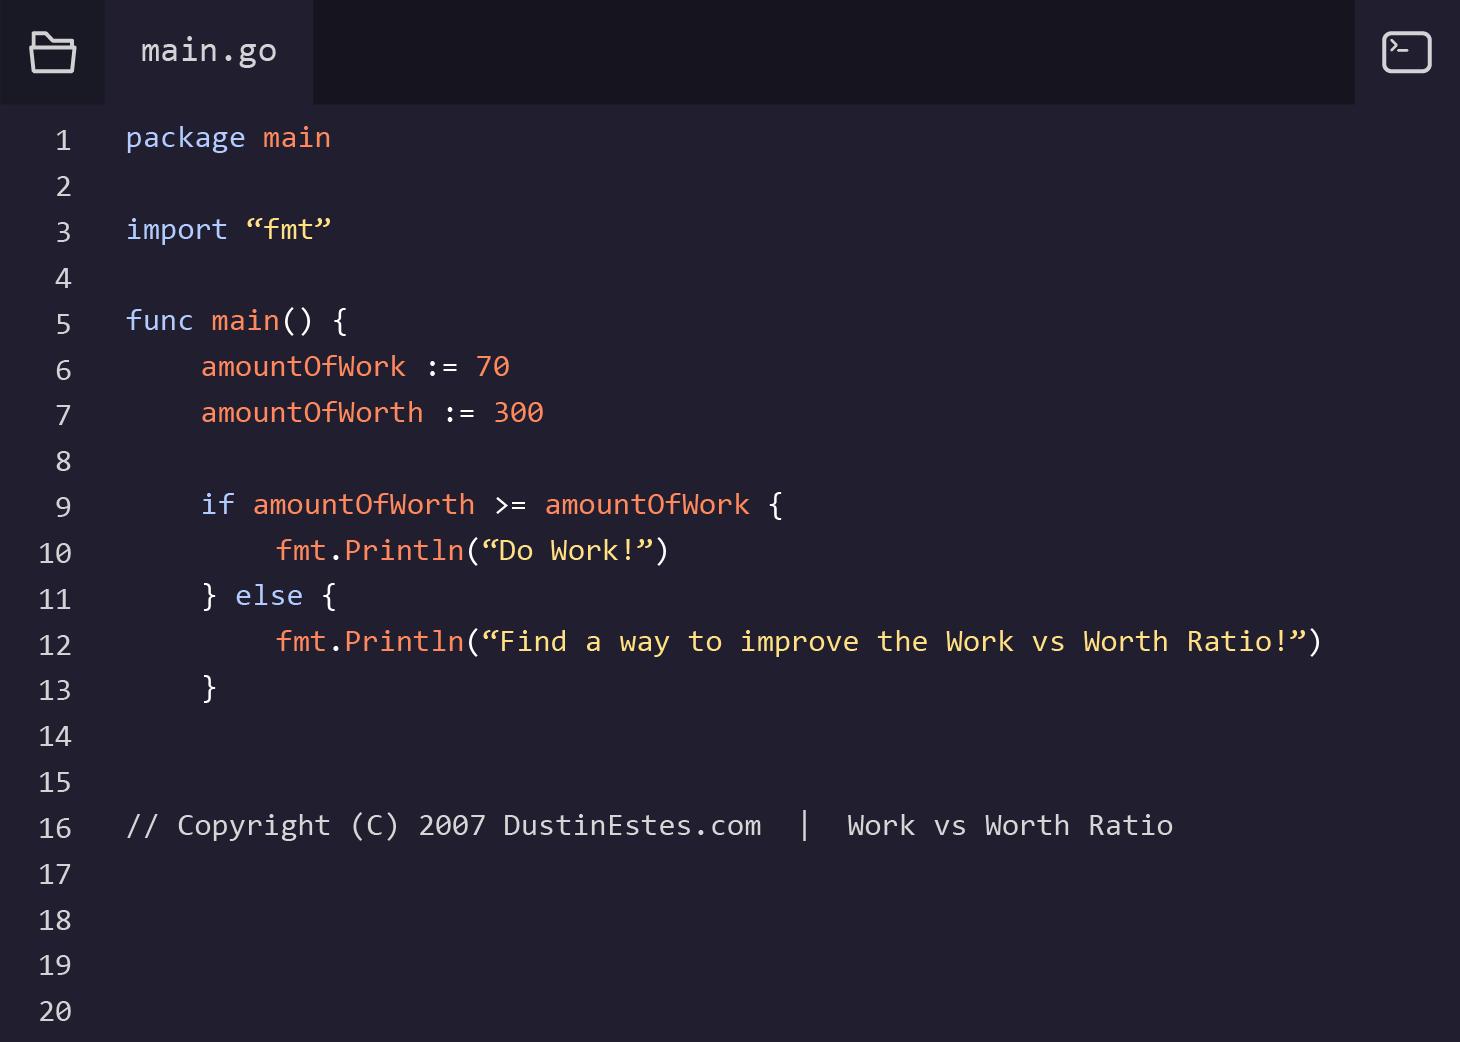 Work vs Worth - GoLang Coding